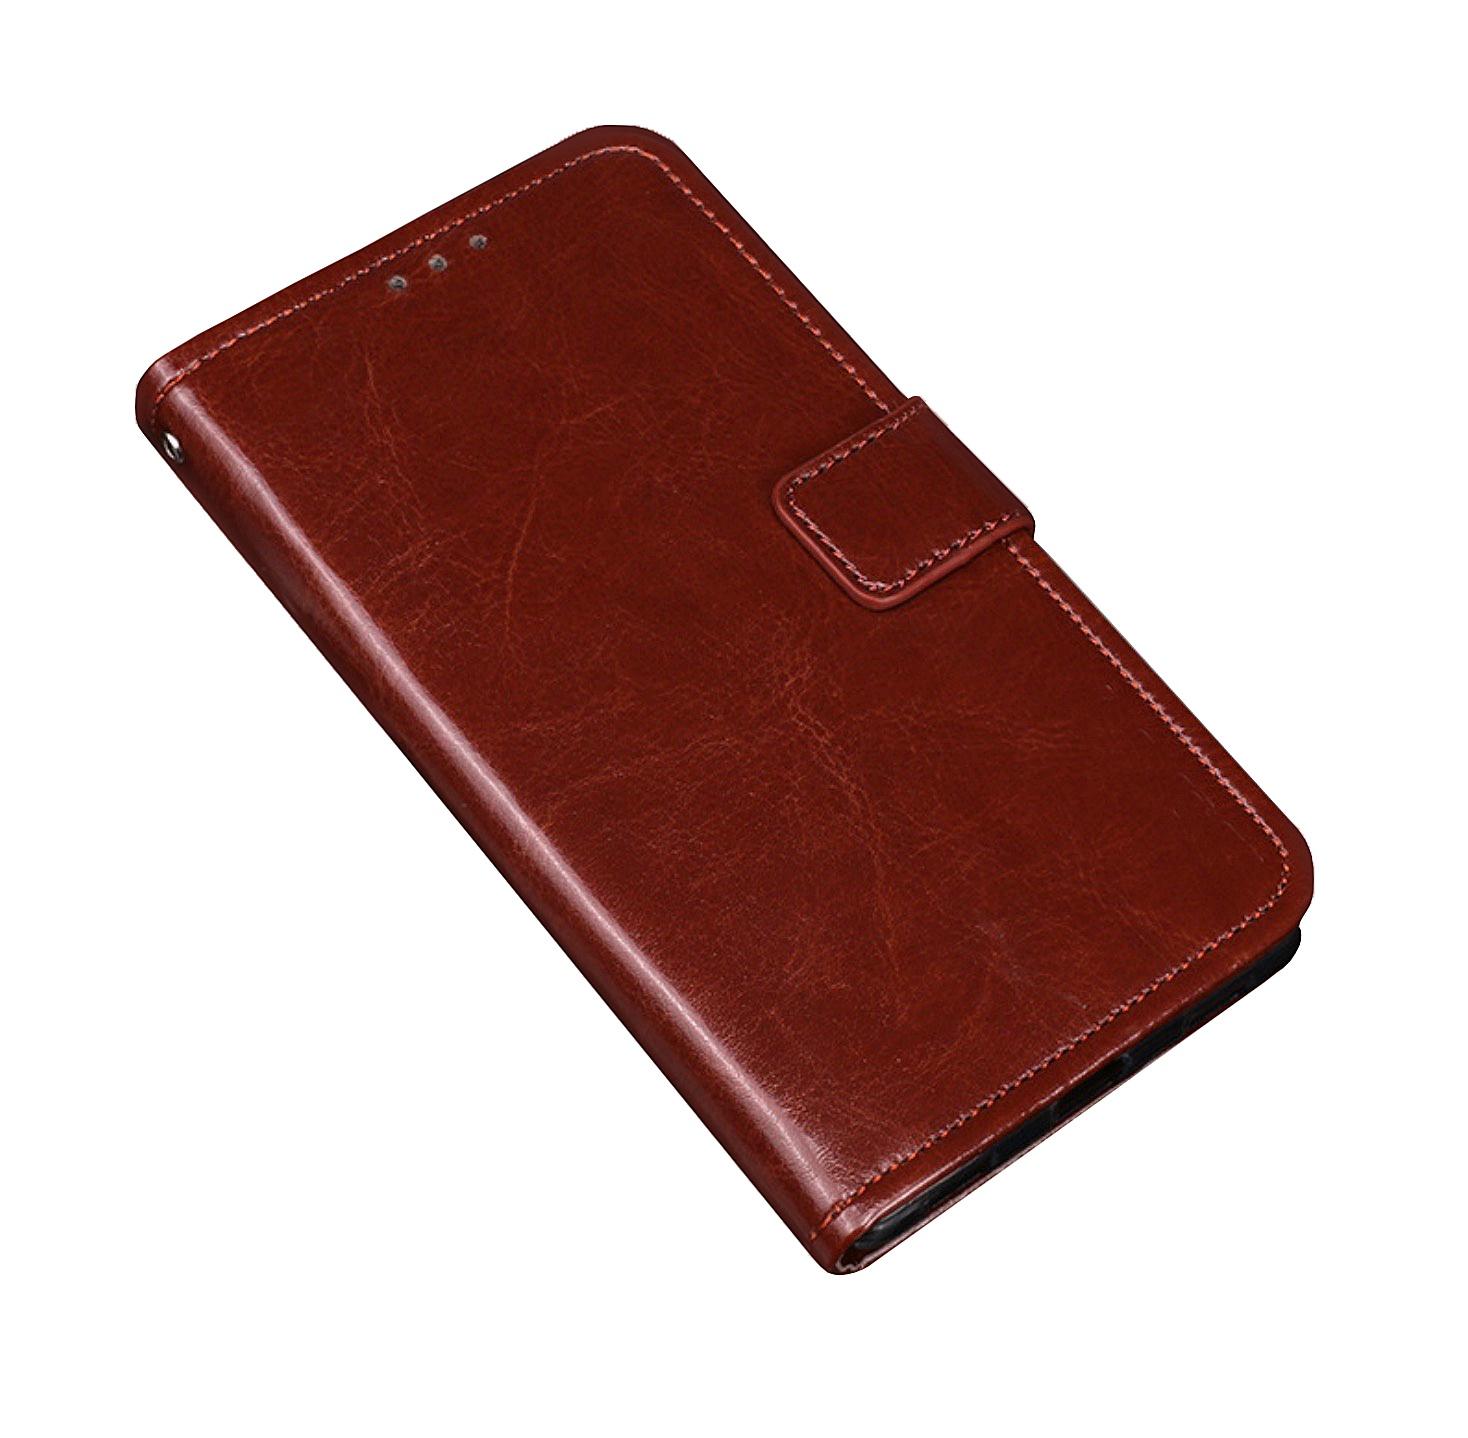 Чехол-книжка MyPads для Huawei Honor 8A/Huawei Y6 (2019)/ Honor 8A Pro/ Y6 Prime 2019 с мульти-подставкой застёжкой и визитницей коричневый